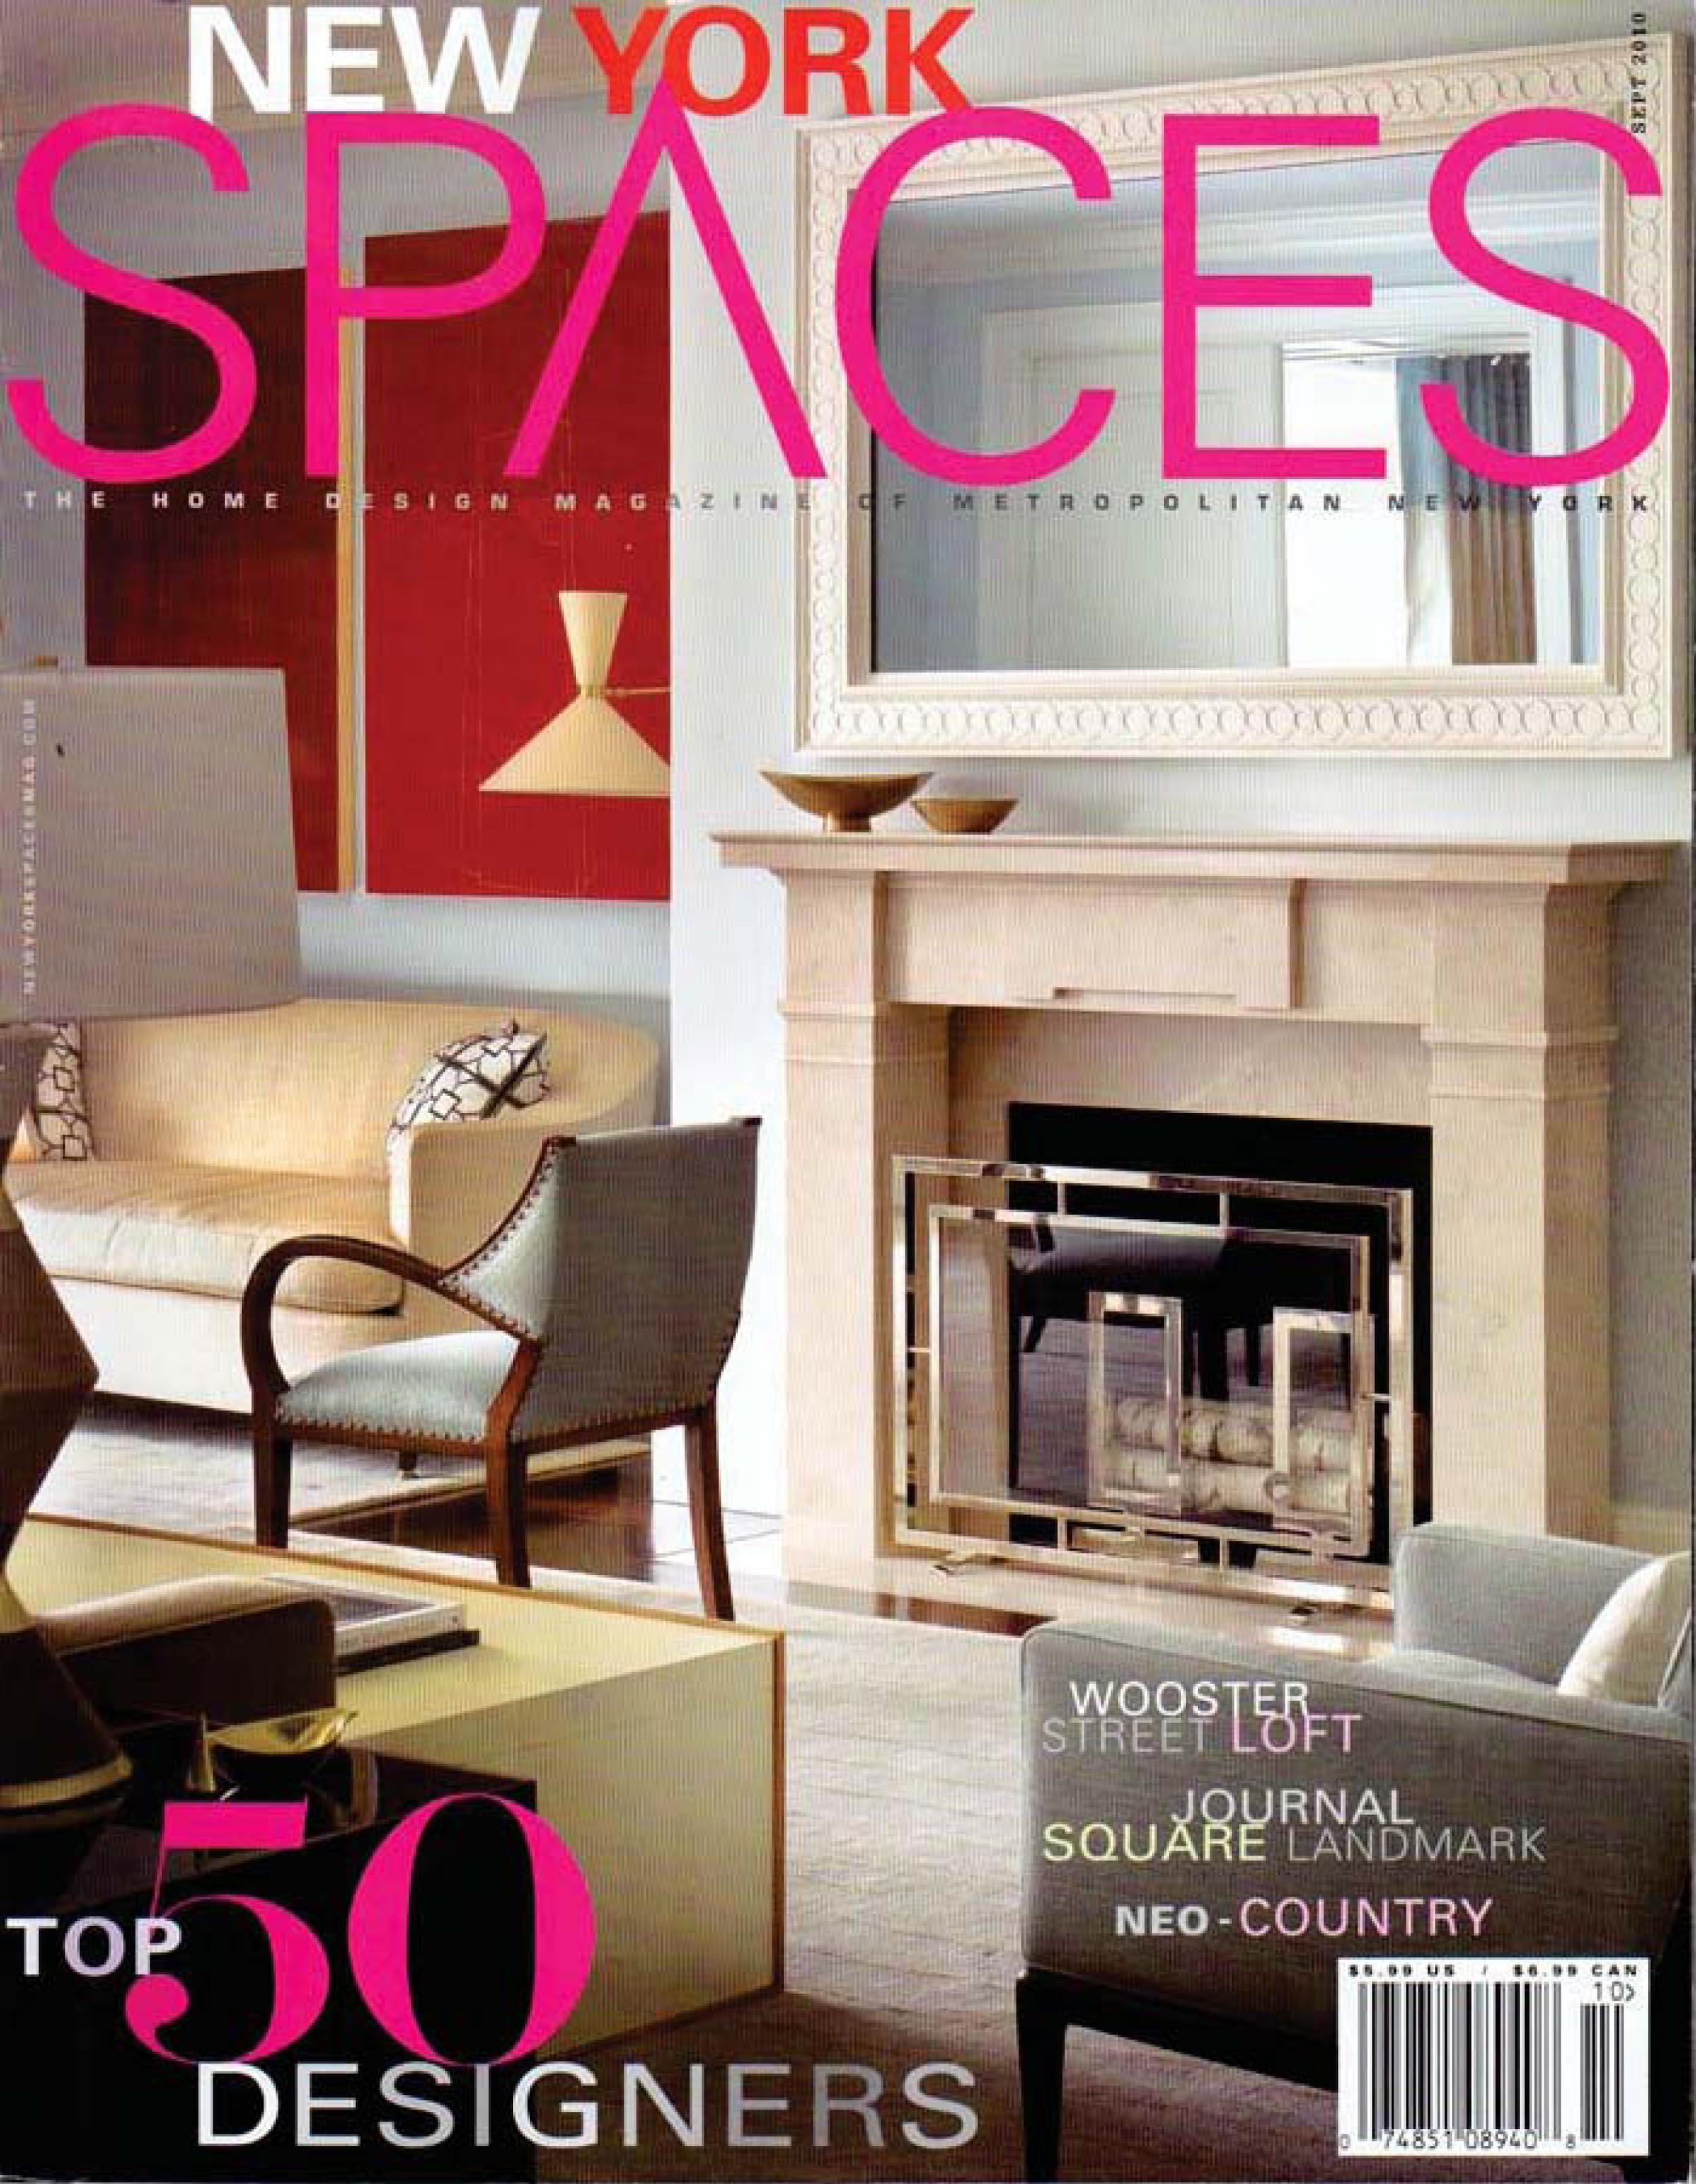 New_York_Spaces_2010_Top_50_Designers 1.jpg